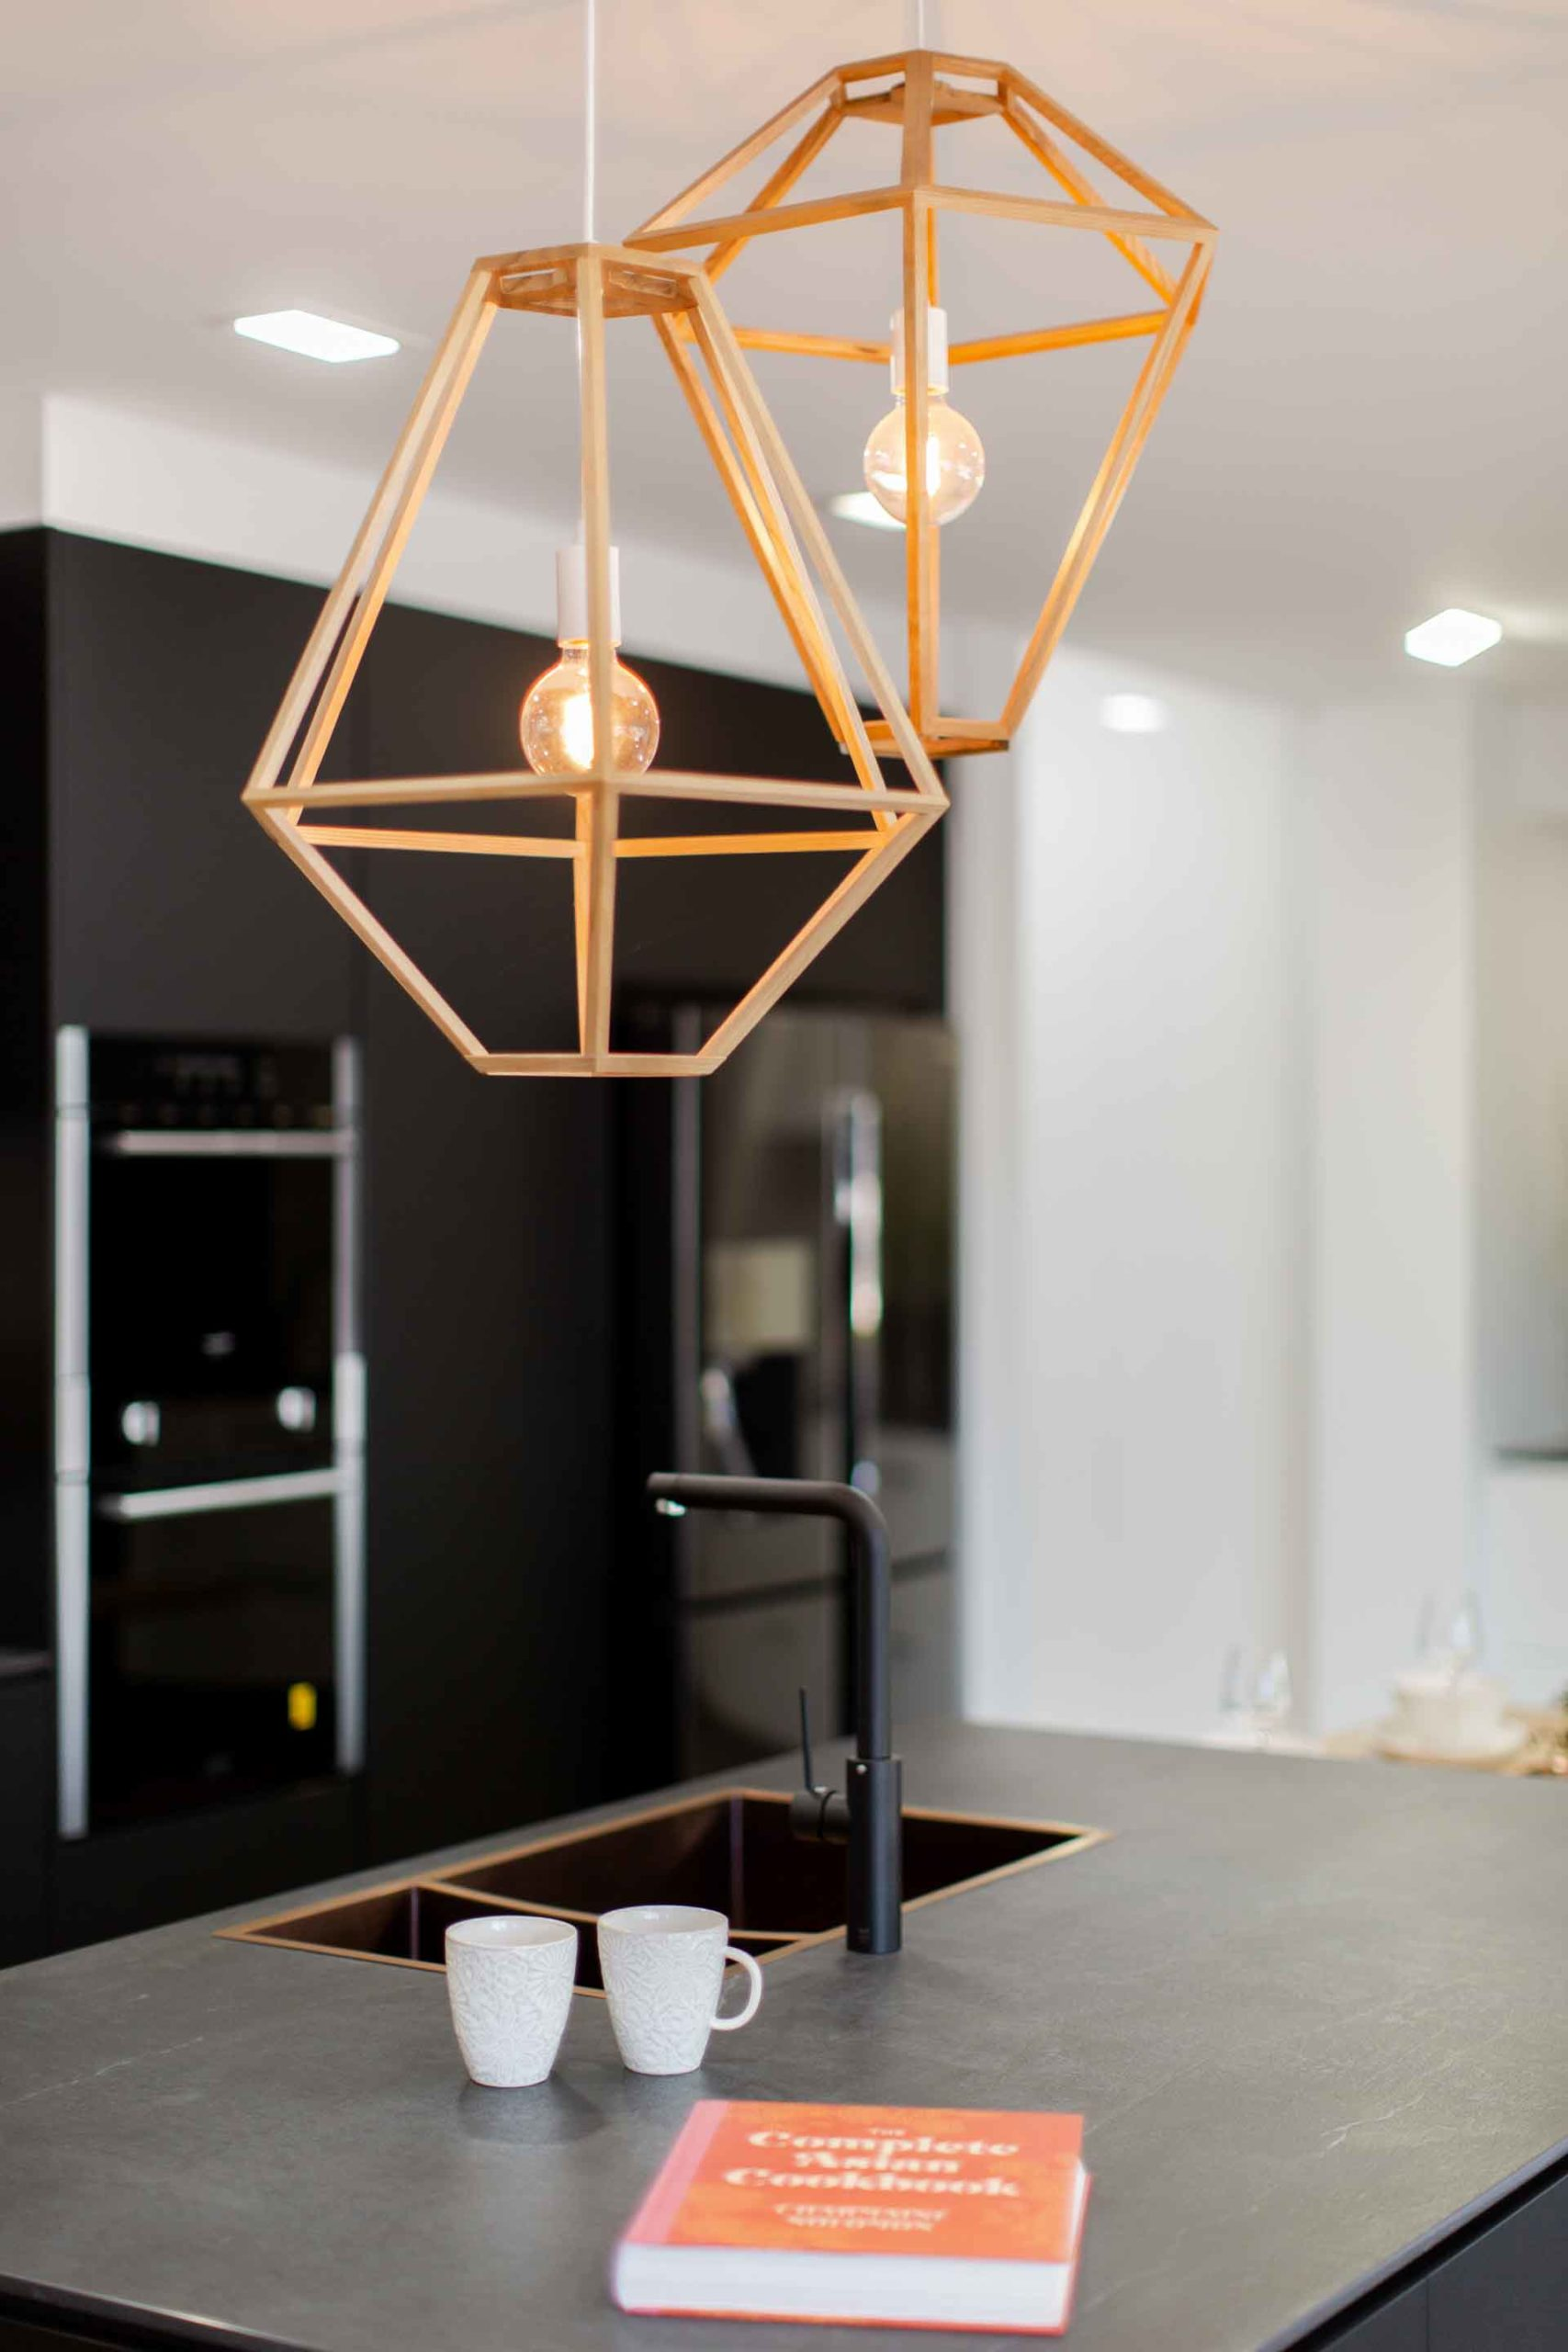 Leopard_Lens_Photography_Inarc_Design_Simson_Kitchen_Showroom-40